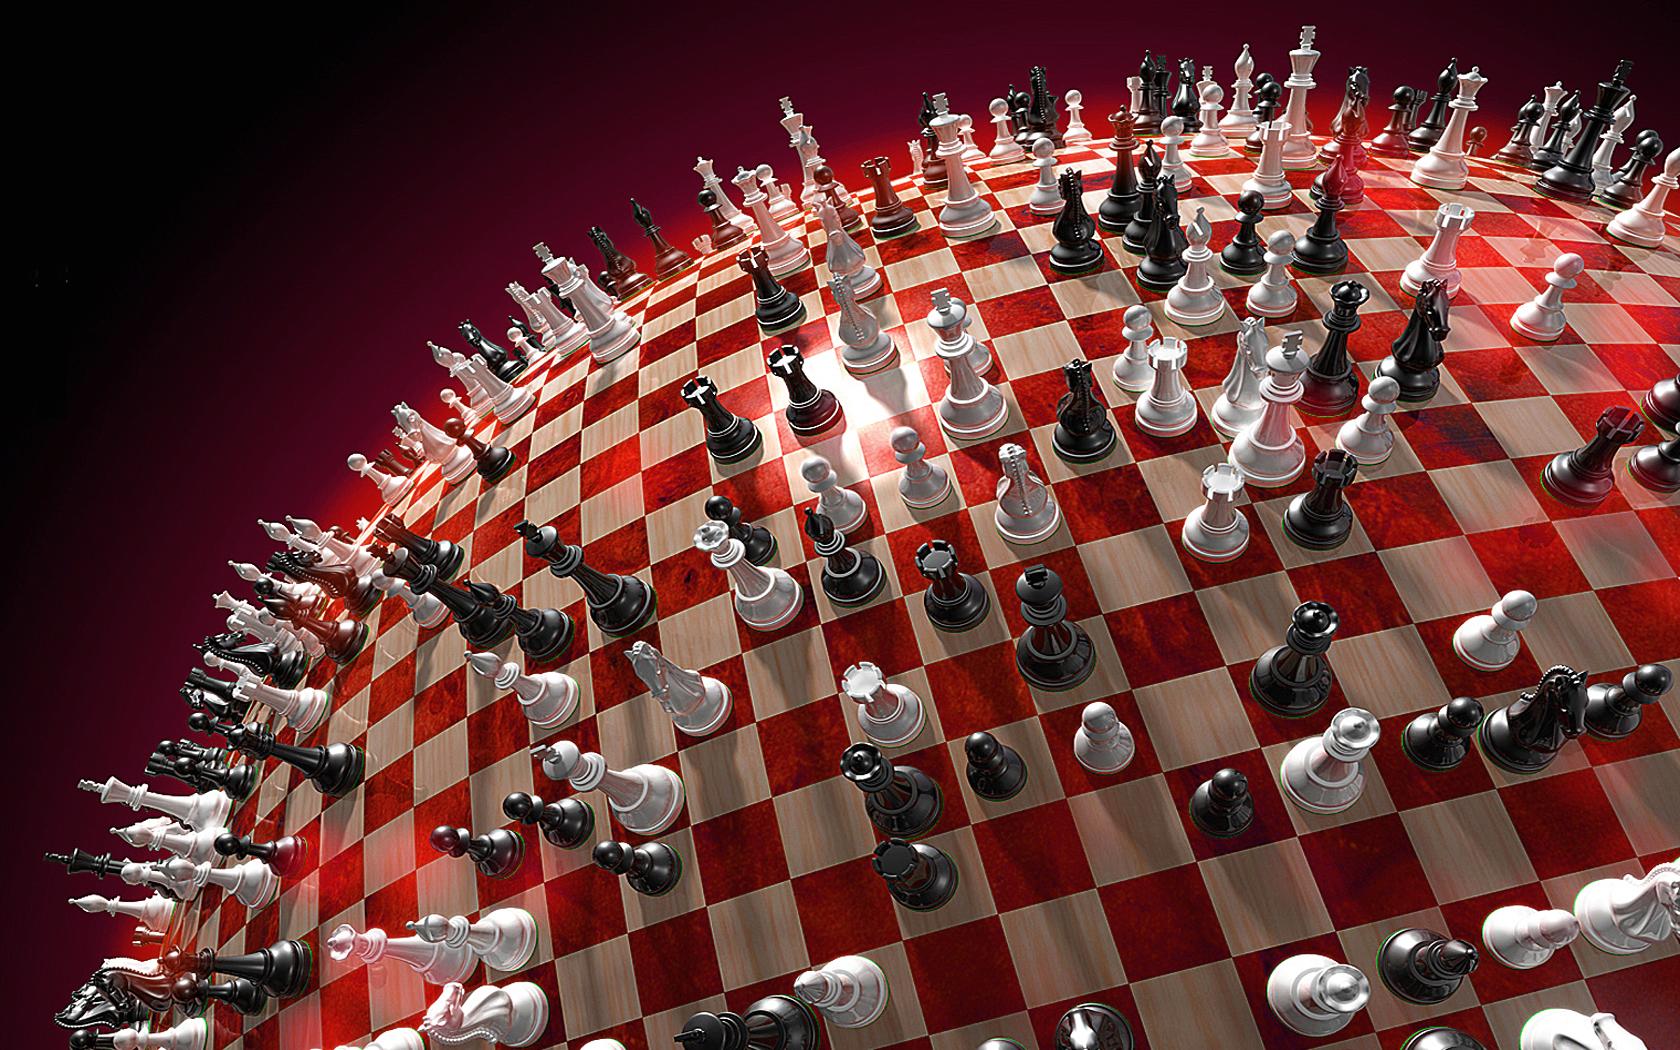 http://www.dcclothesline.com/wp-content/uploads/2014/03/world-war-iii-chessboard.jpg